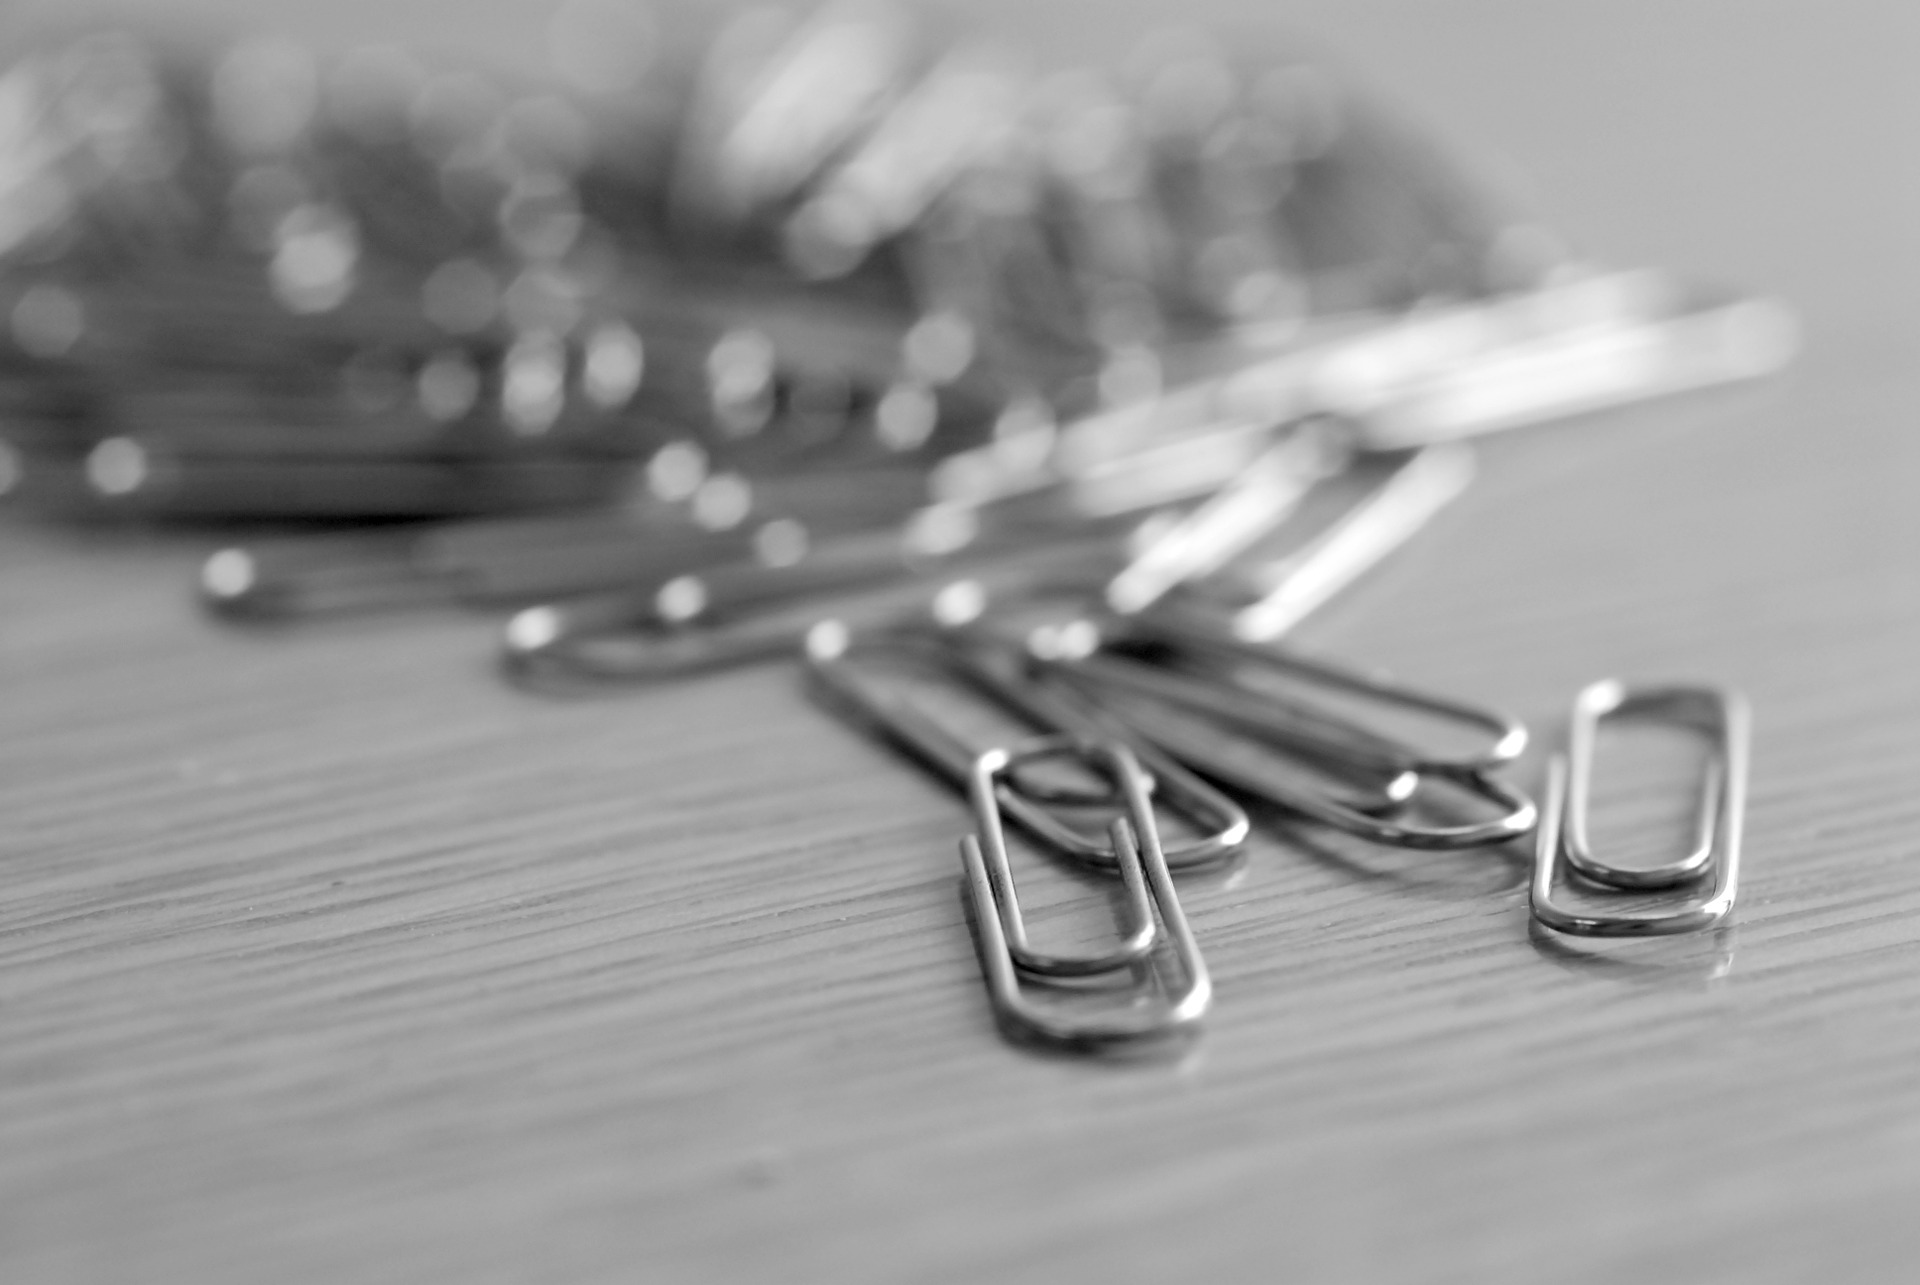 paper-clip-400821_1920